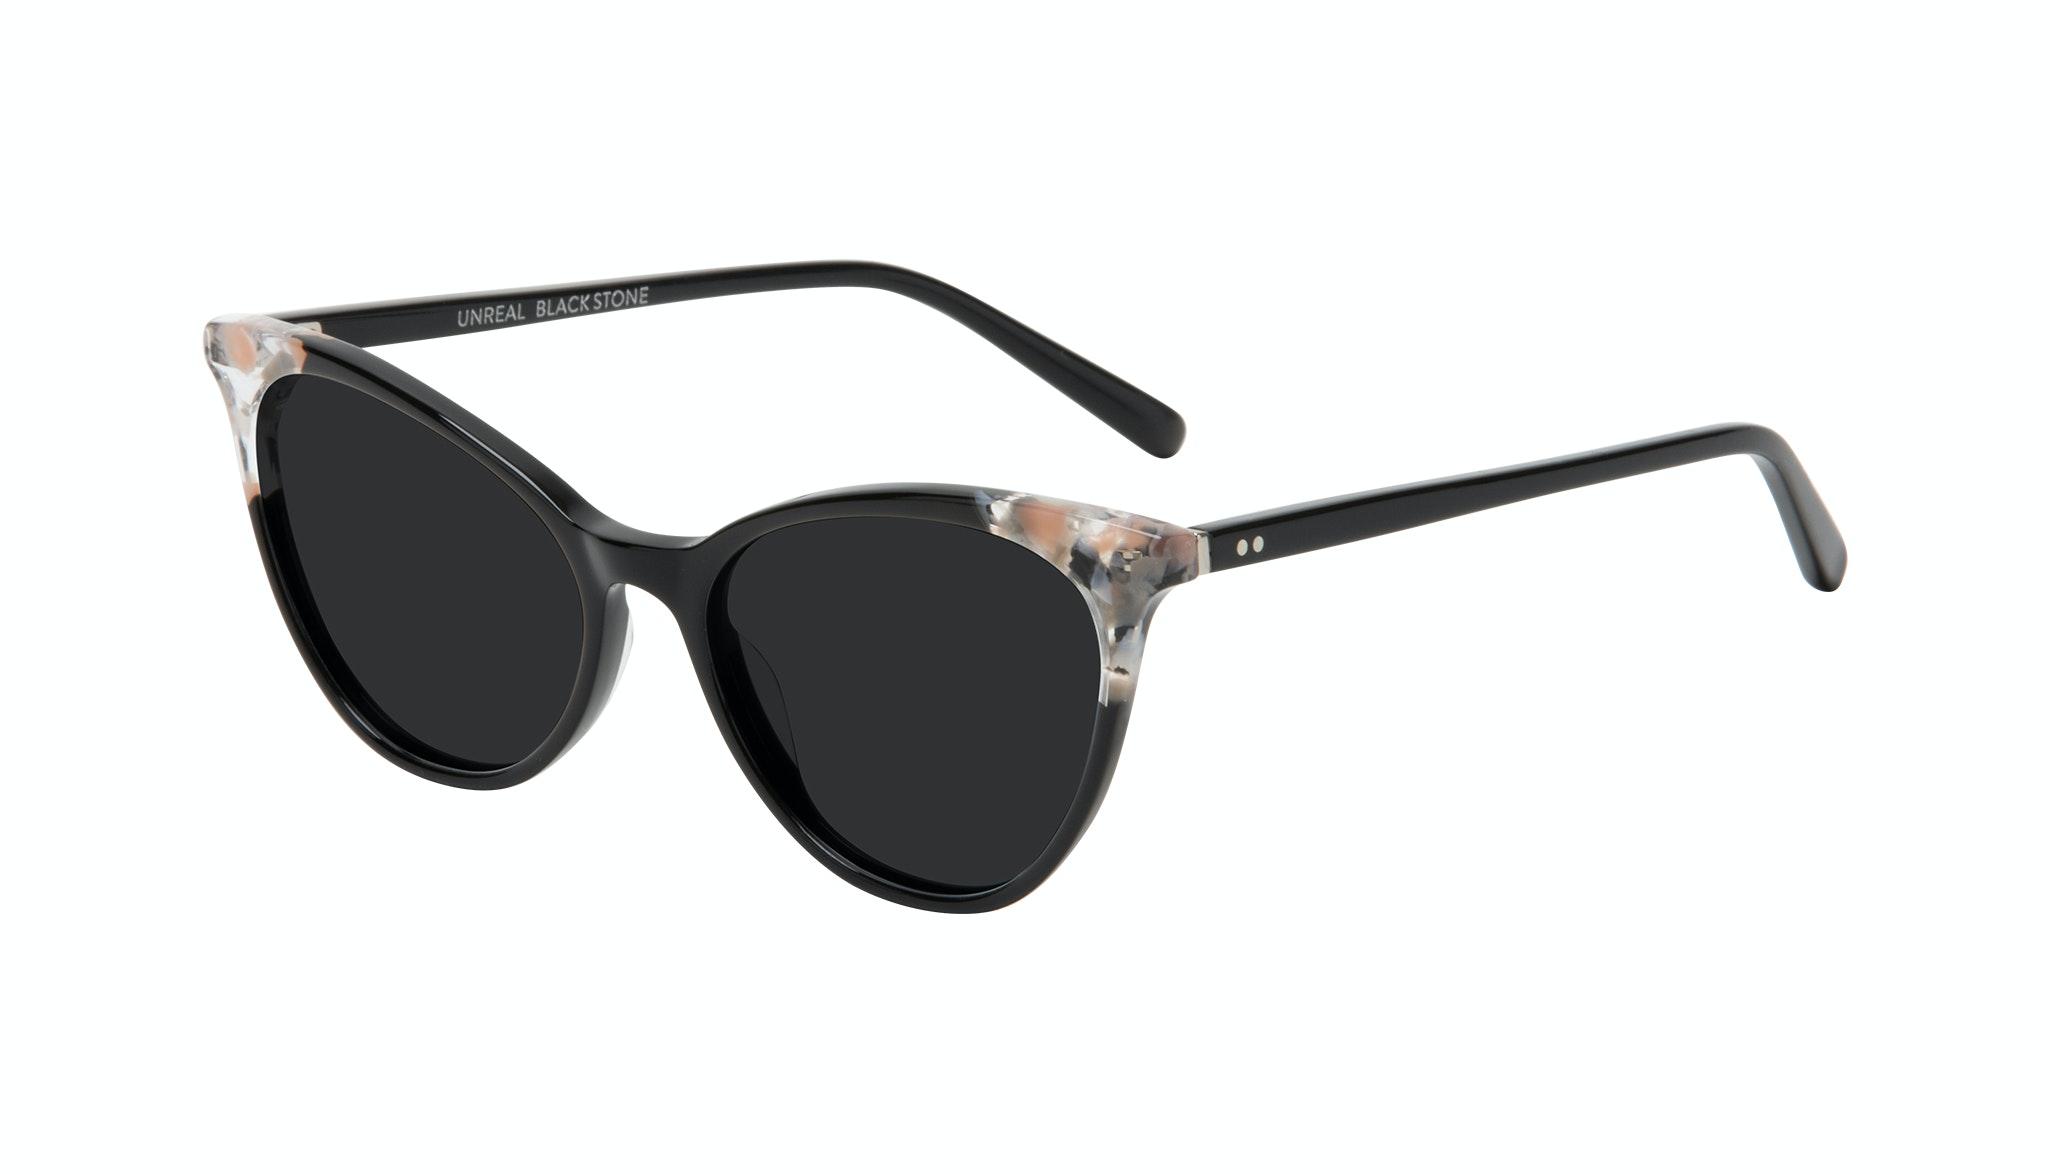 Affordable Fashion Glasses Cat Eye Sunglasses Women Unreal Black Stone Tilt